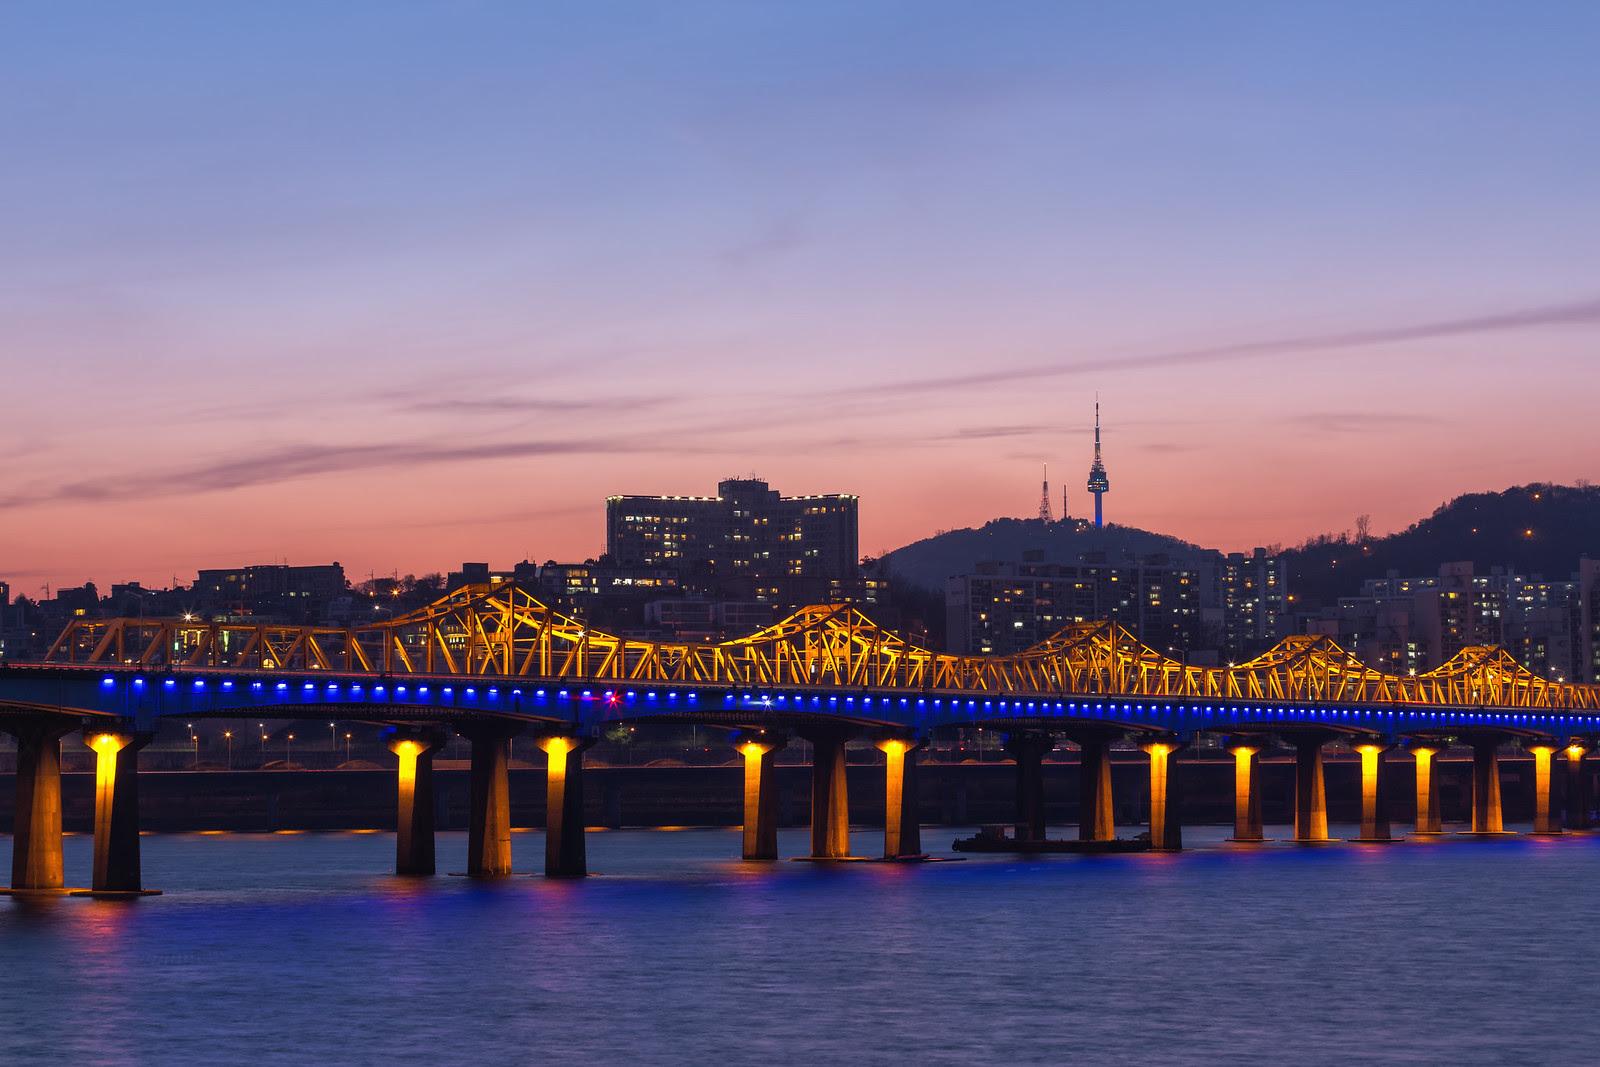 North Seoul Tower